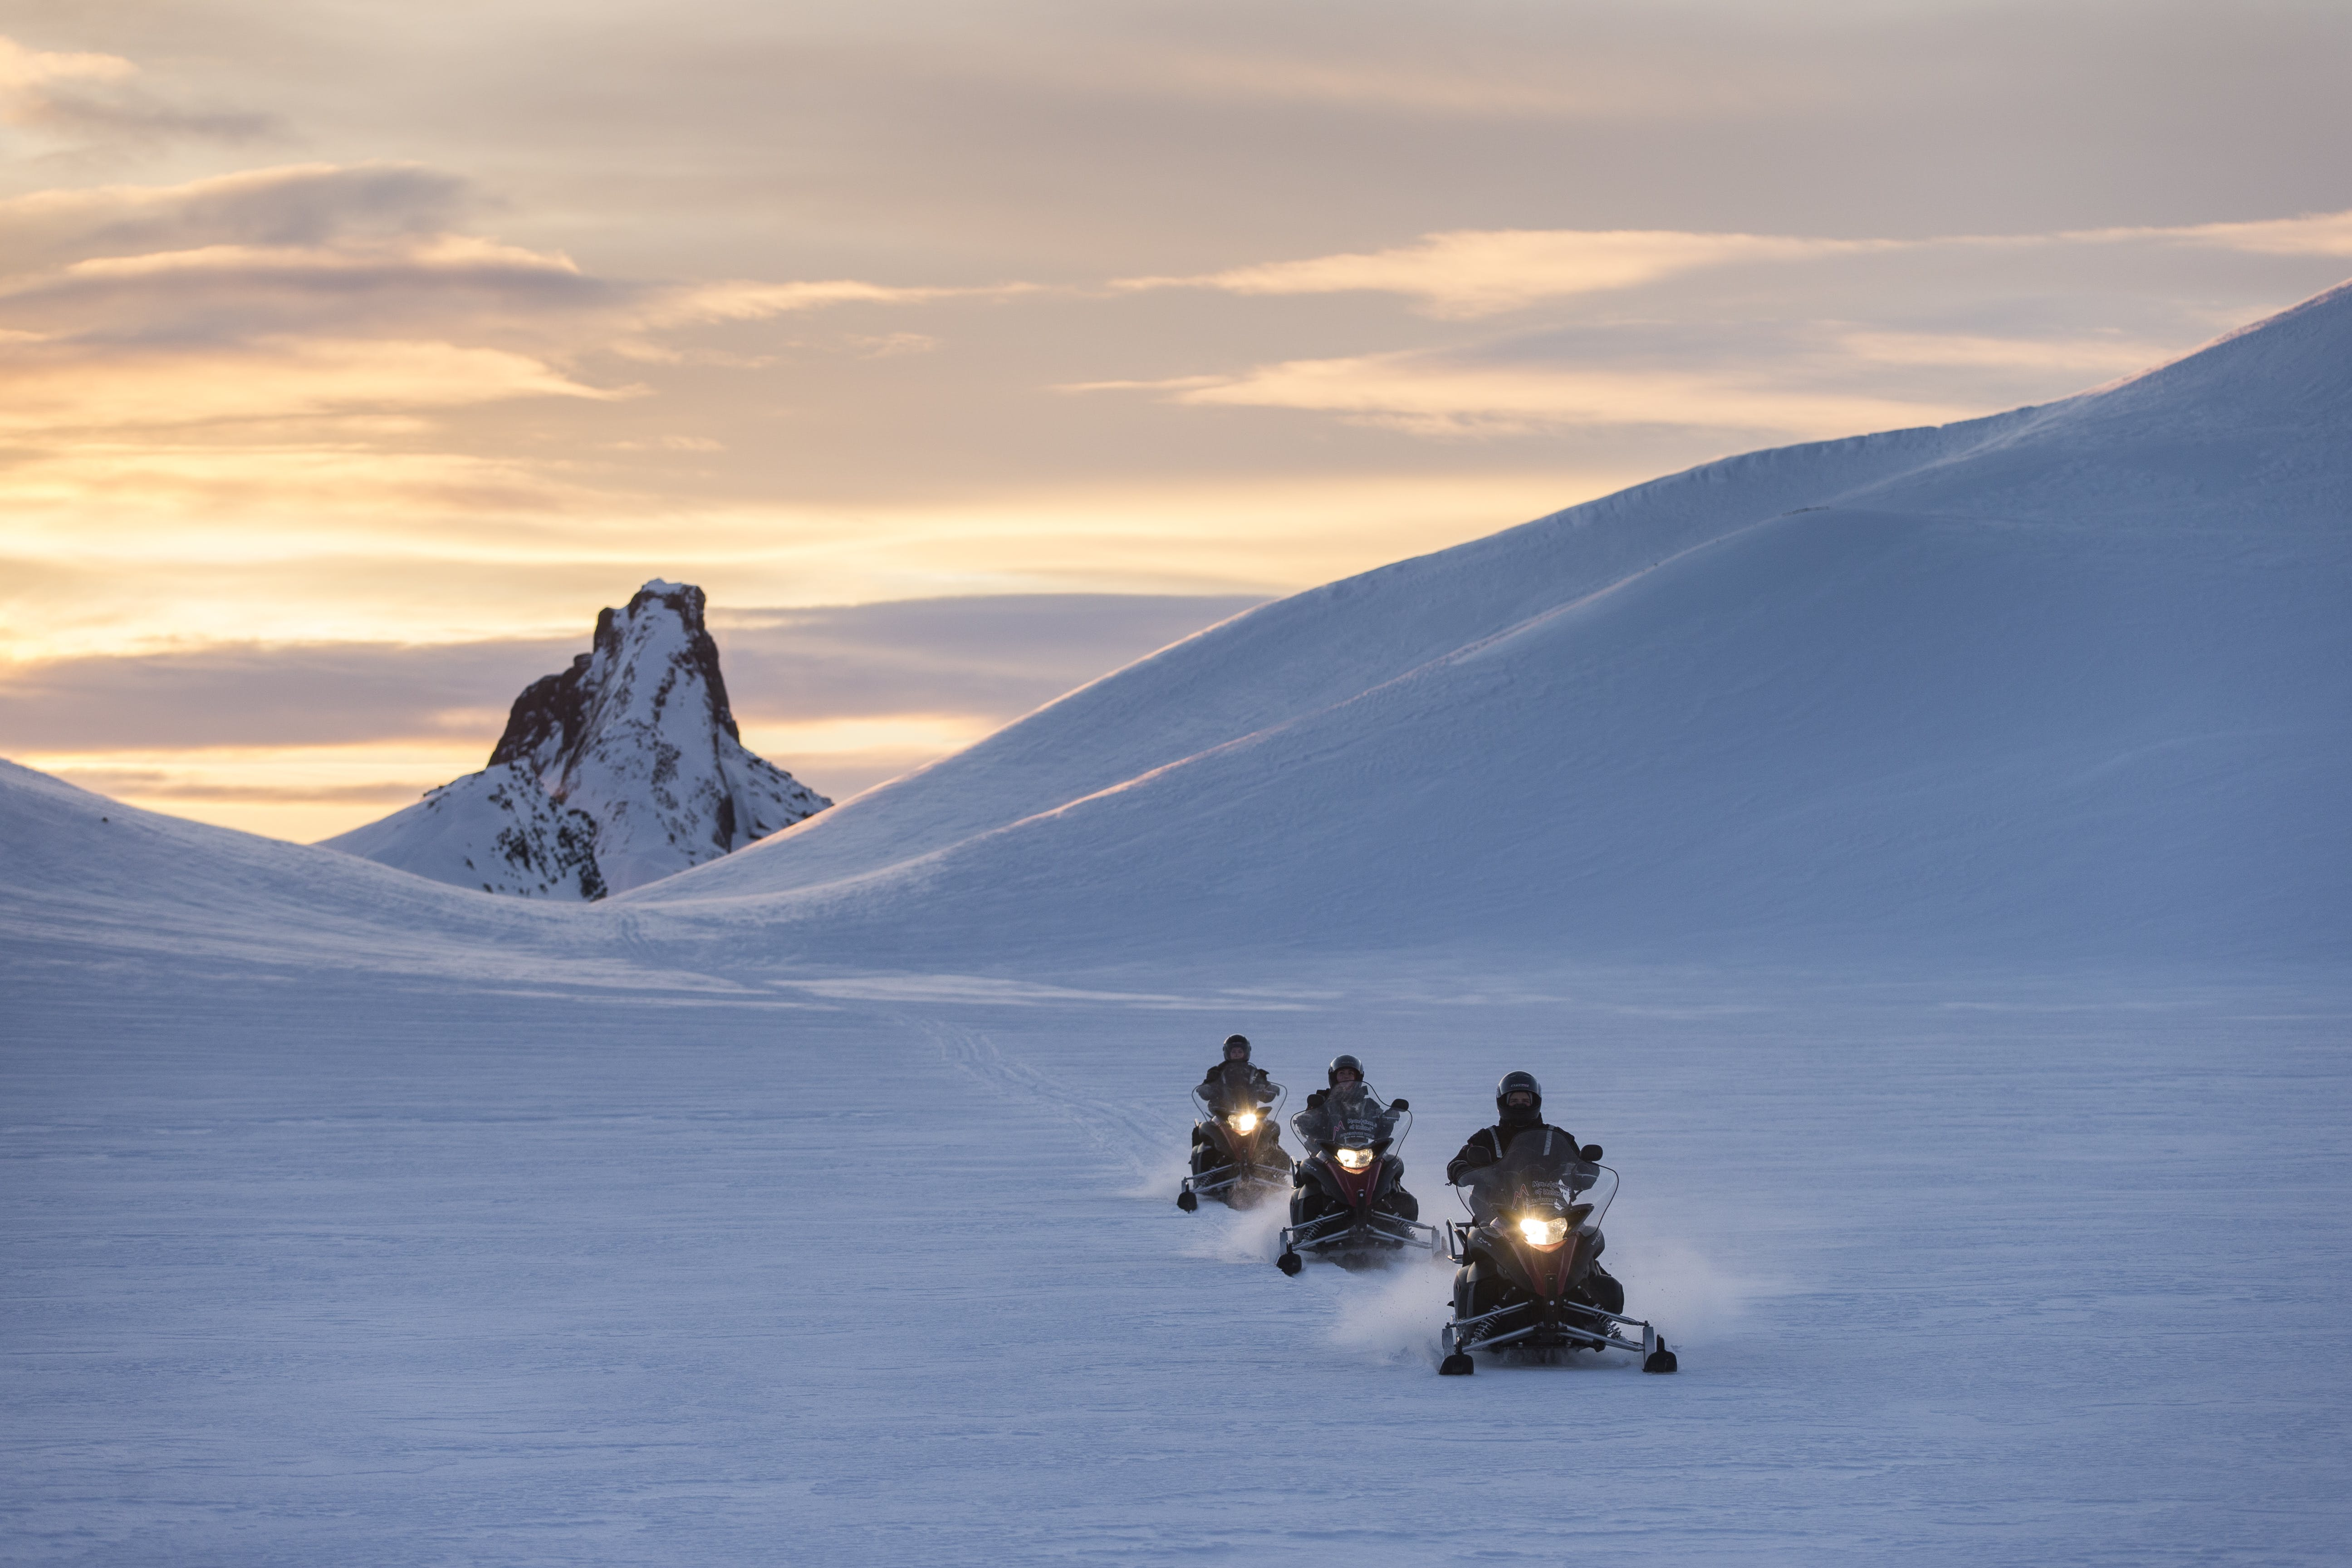 Snowmobile Tour and an Into the Glacier on Langjokull